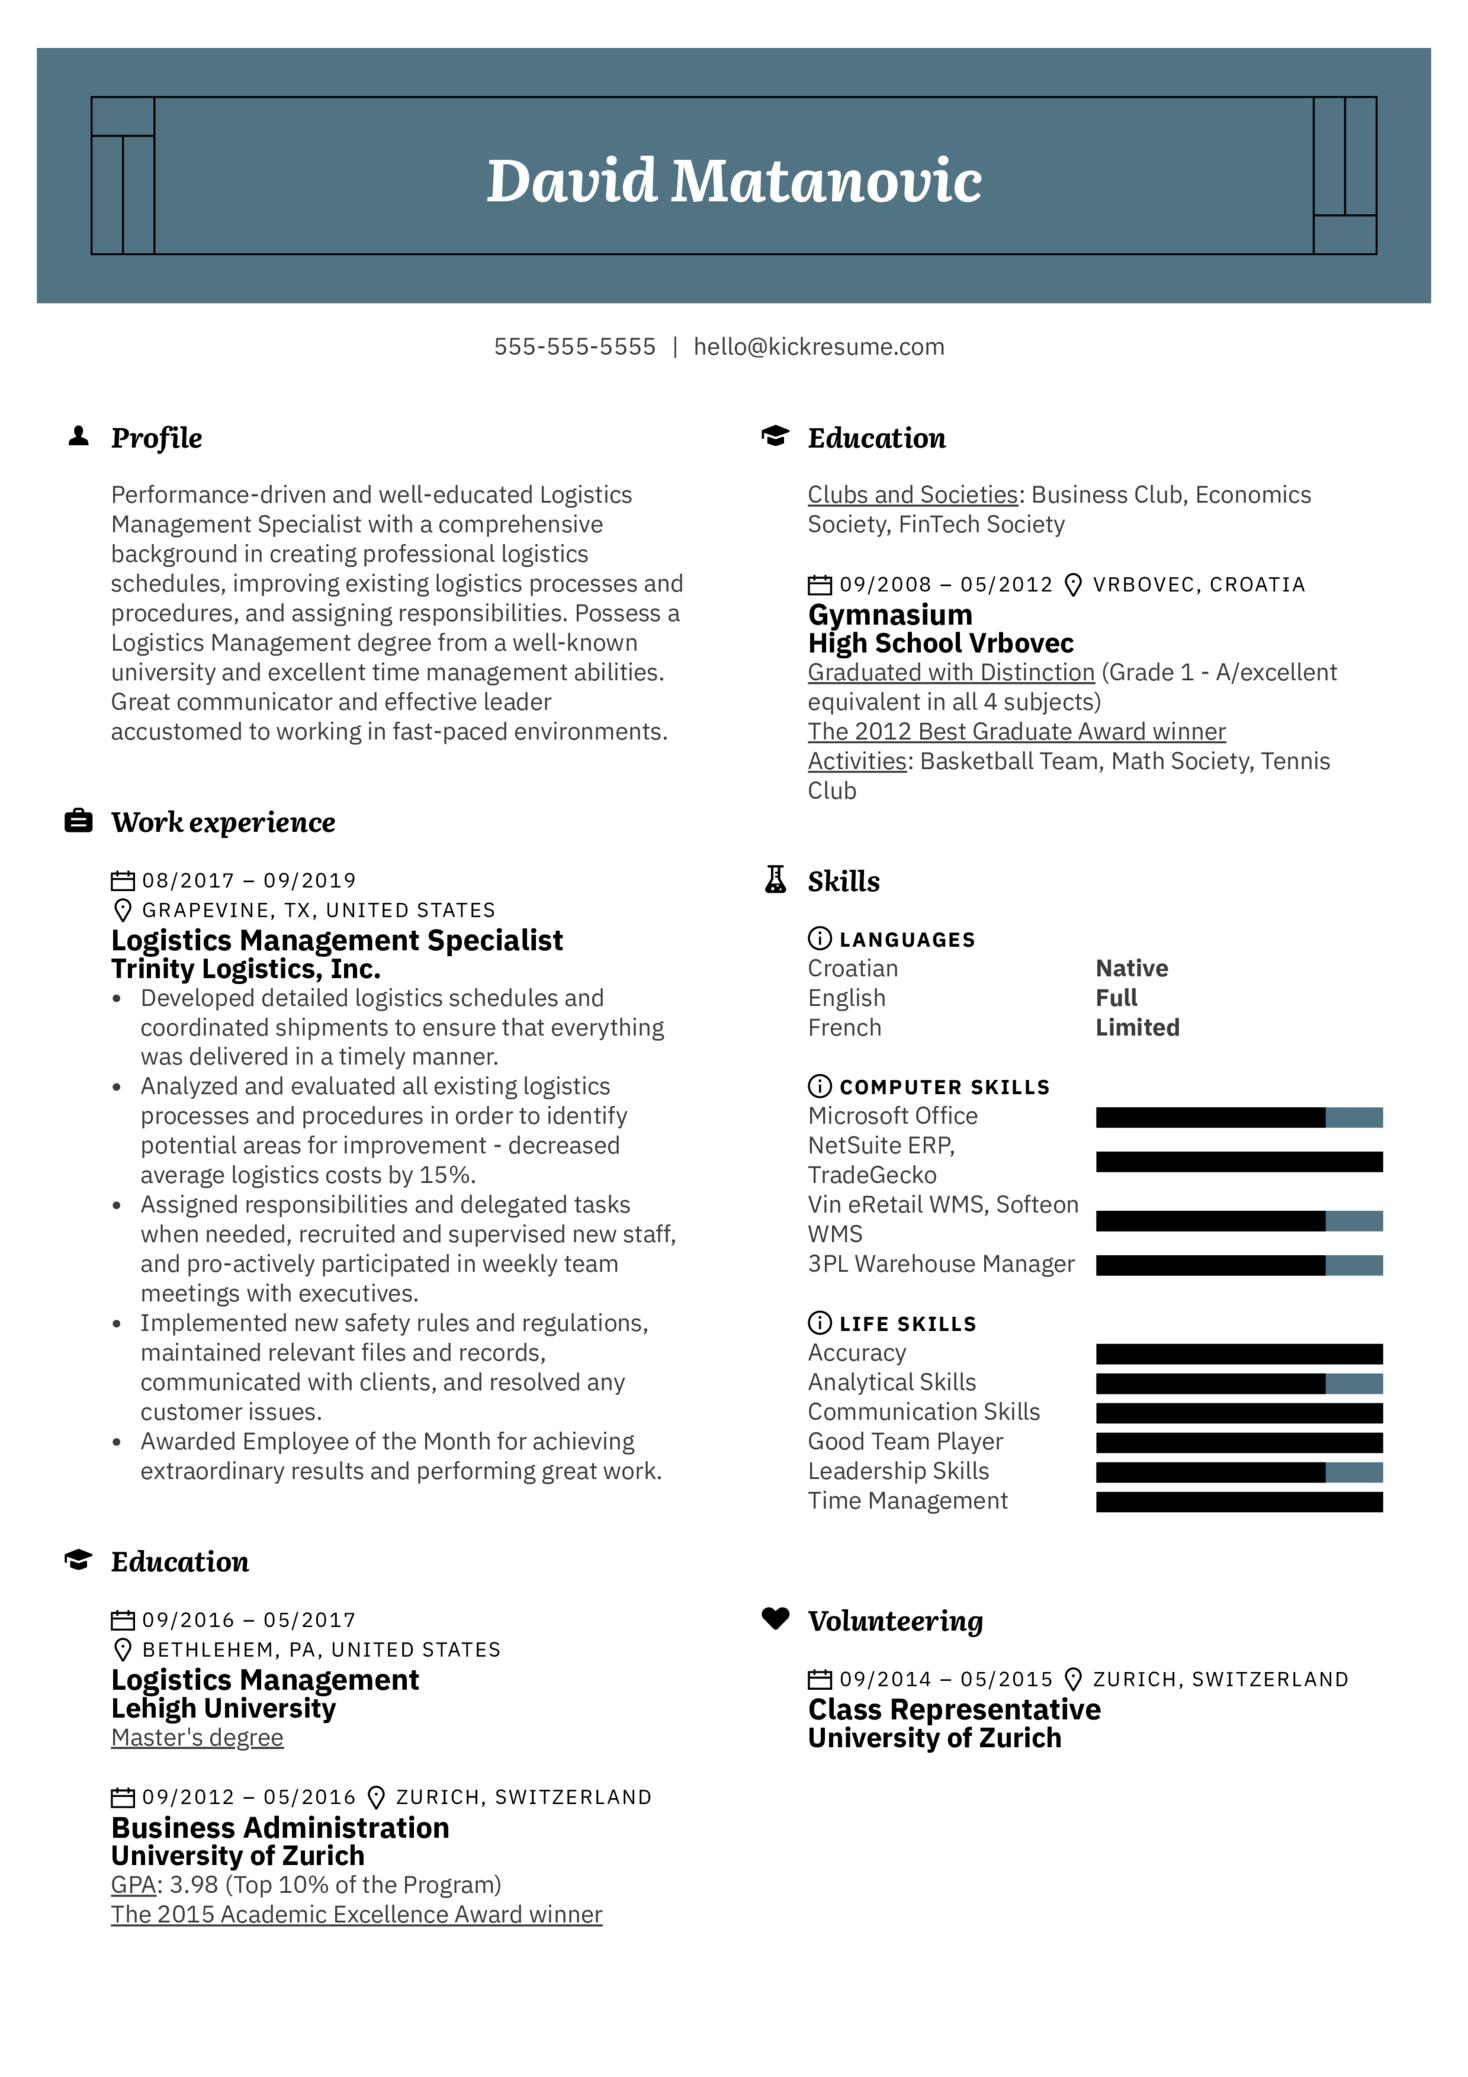 Logistics Management Specialist Resume Example (Teil 1)